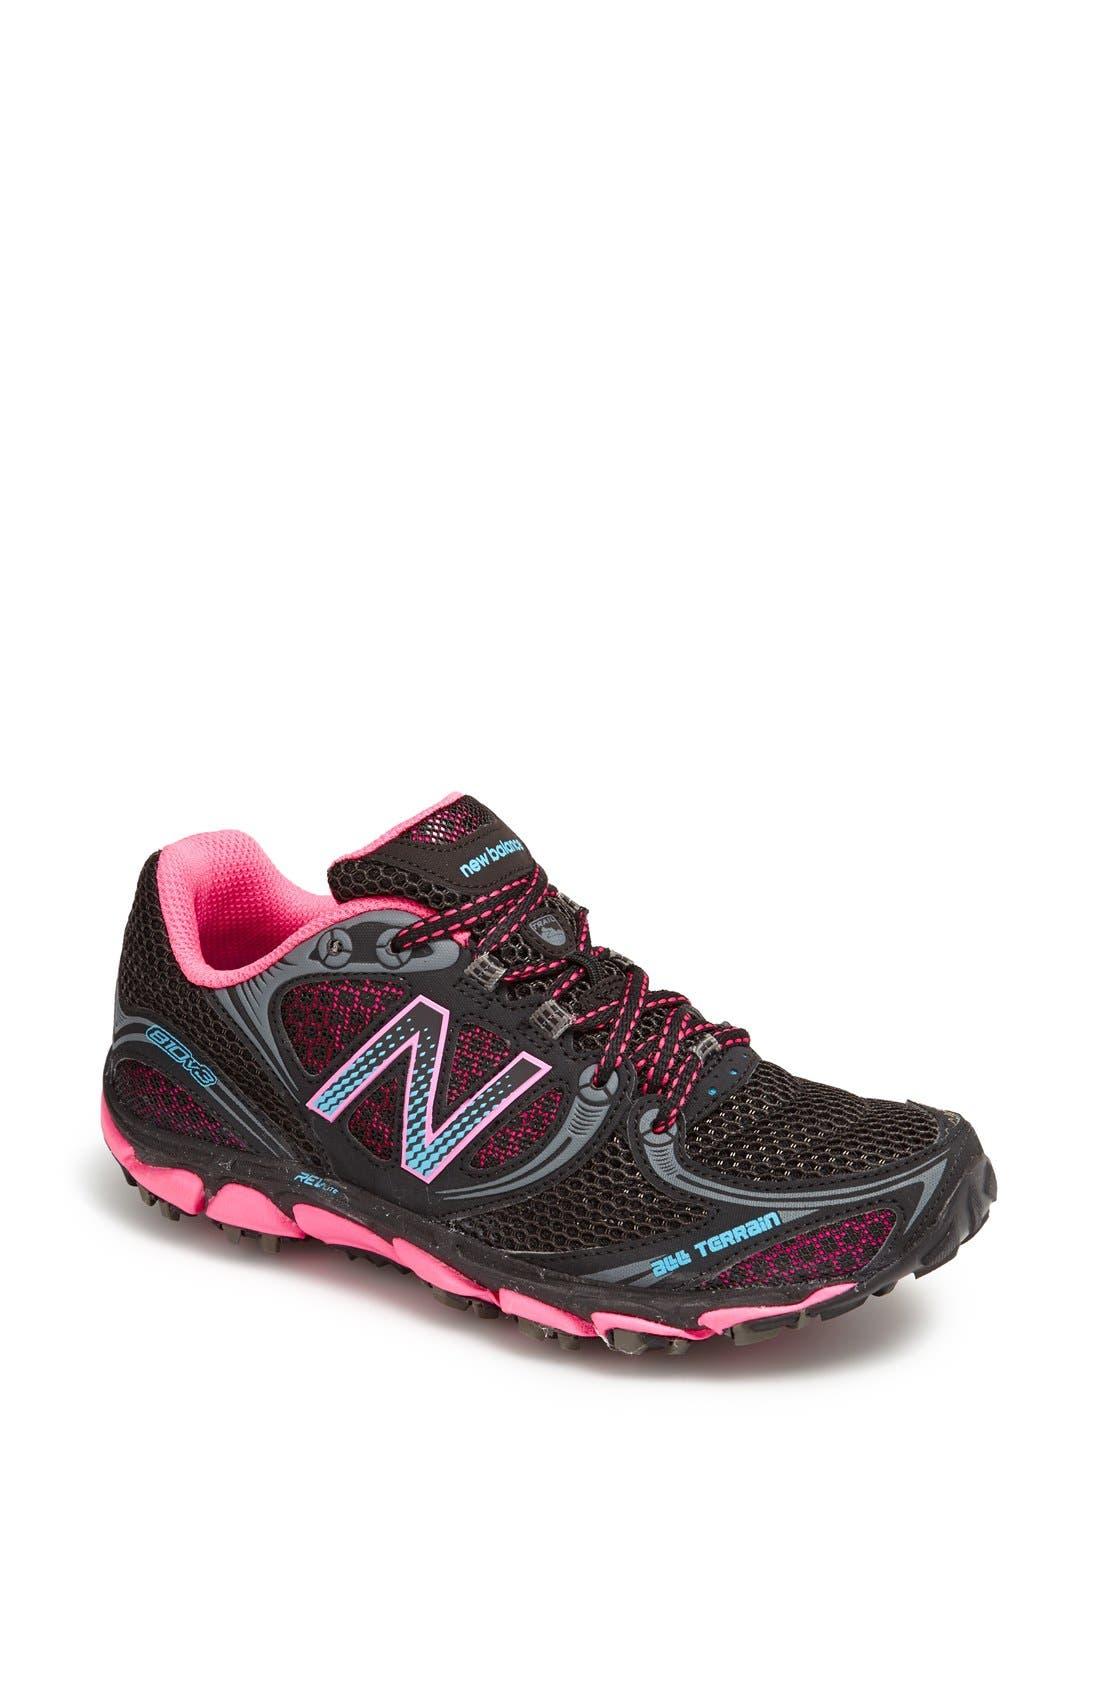 '810' Trail Running Shoe,                             Main thumbnail 1, color,                             018